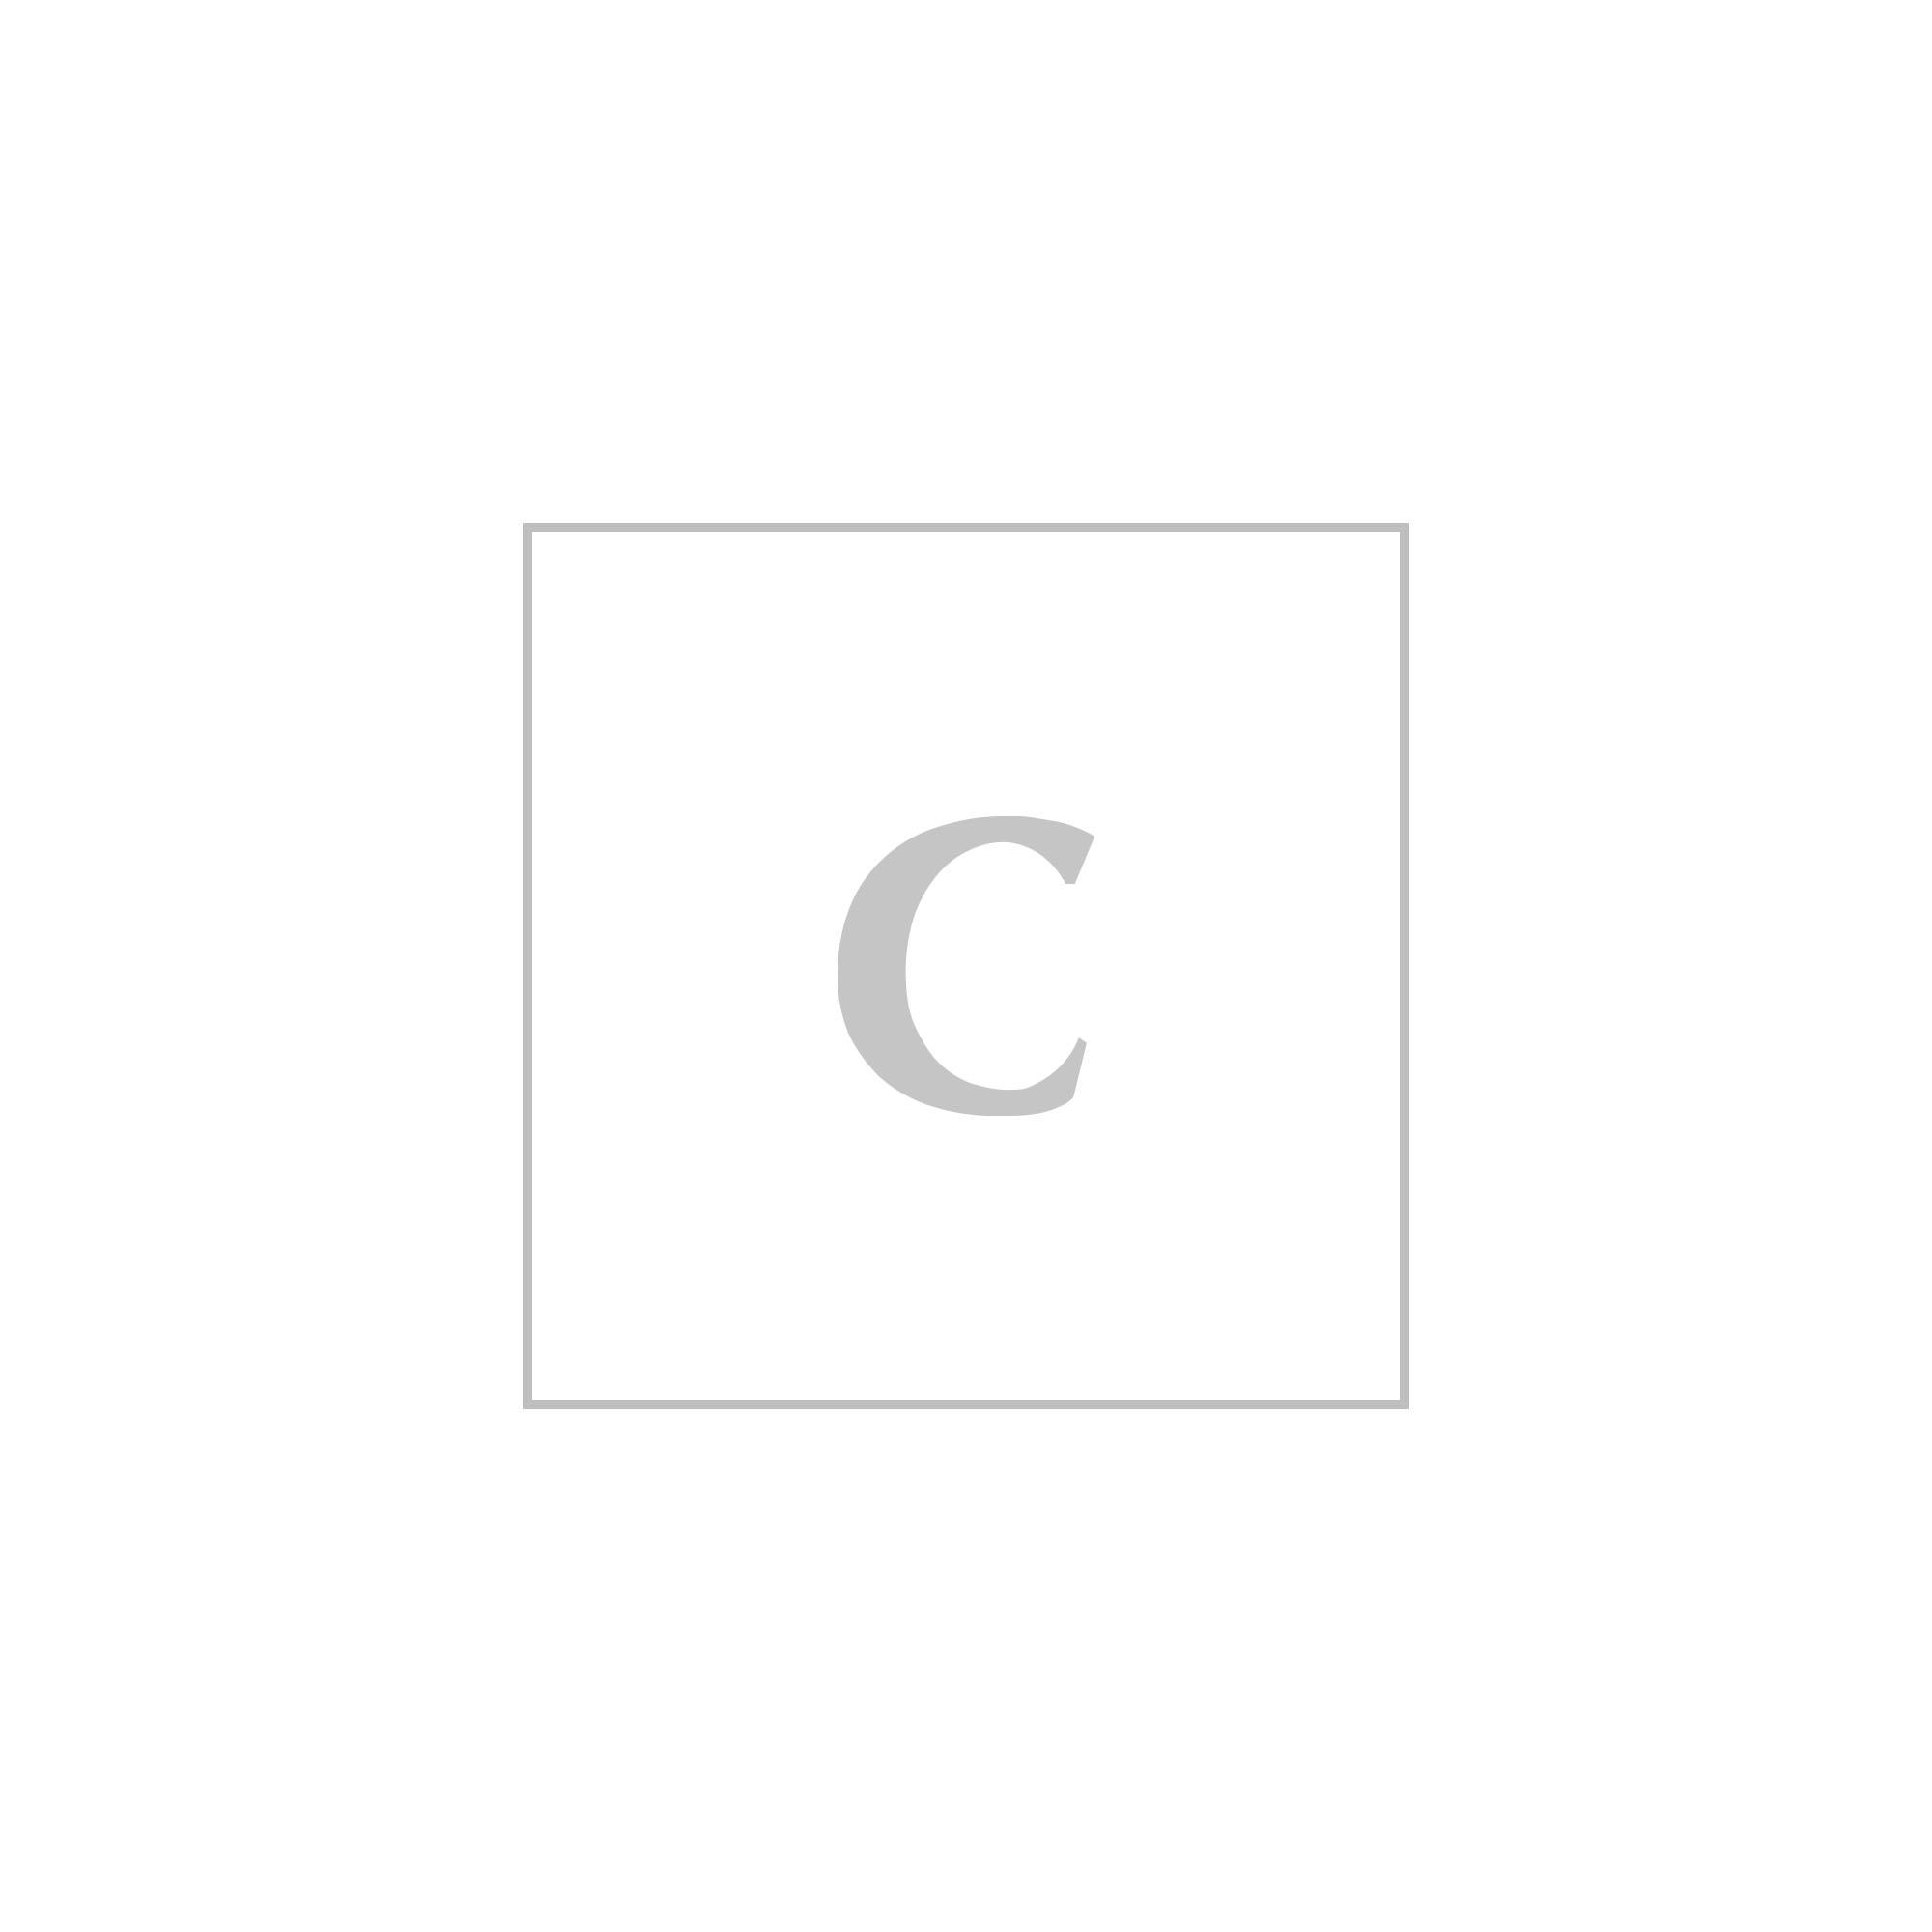 Dolce & gabbana dauphine continental wallet